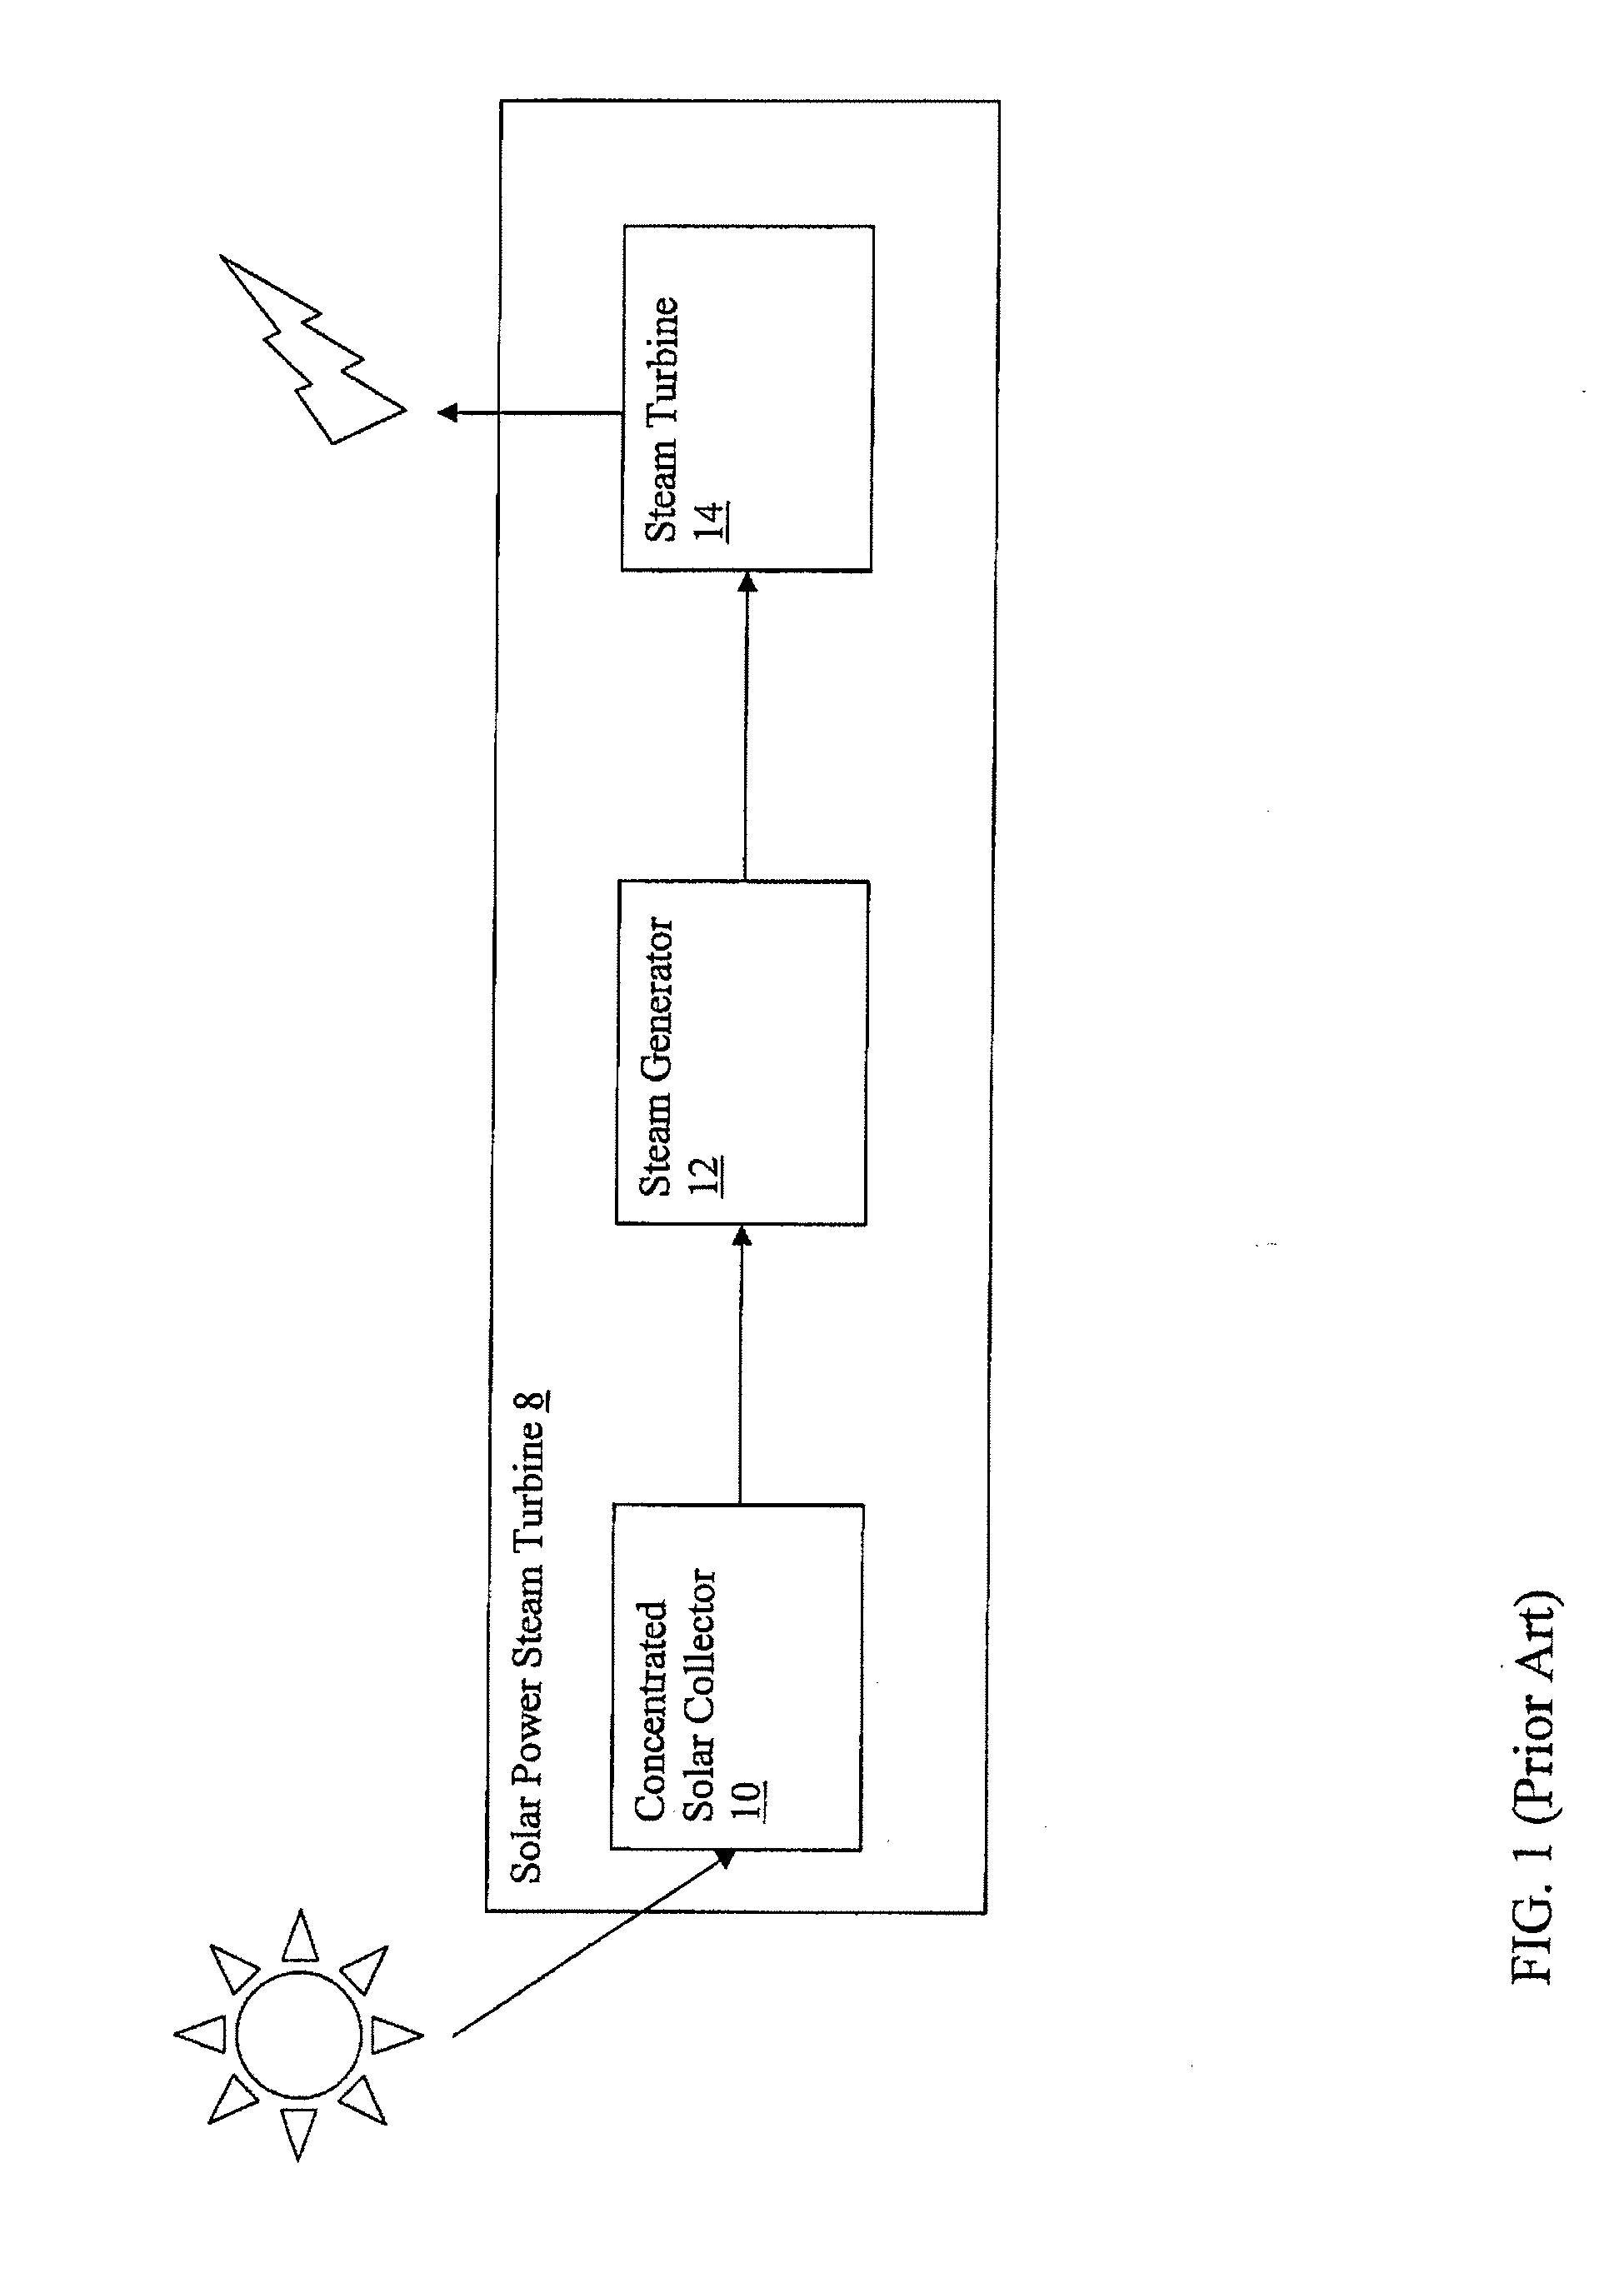 Patent EP A1 Steam turbine performance testing Google